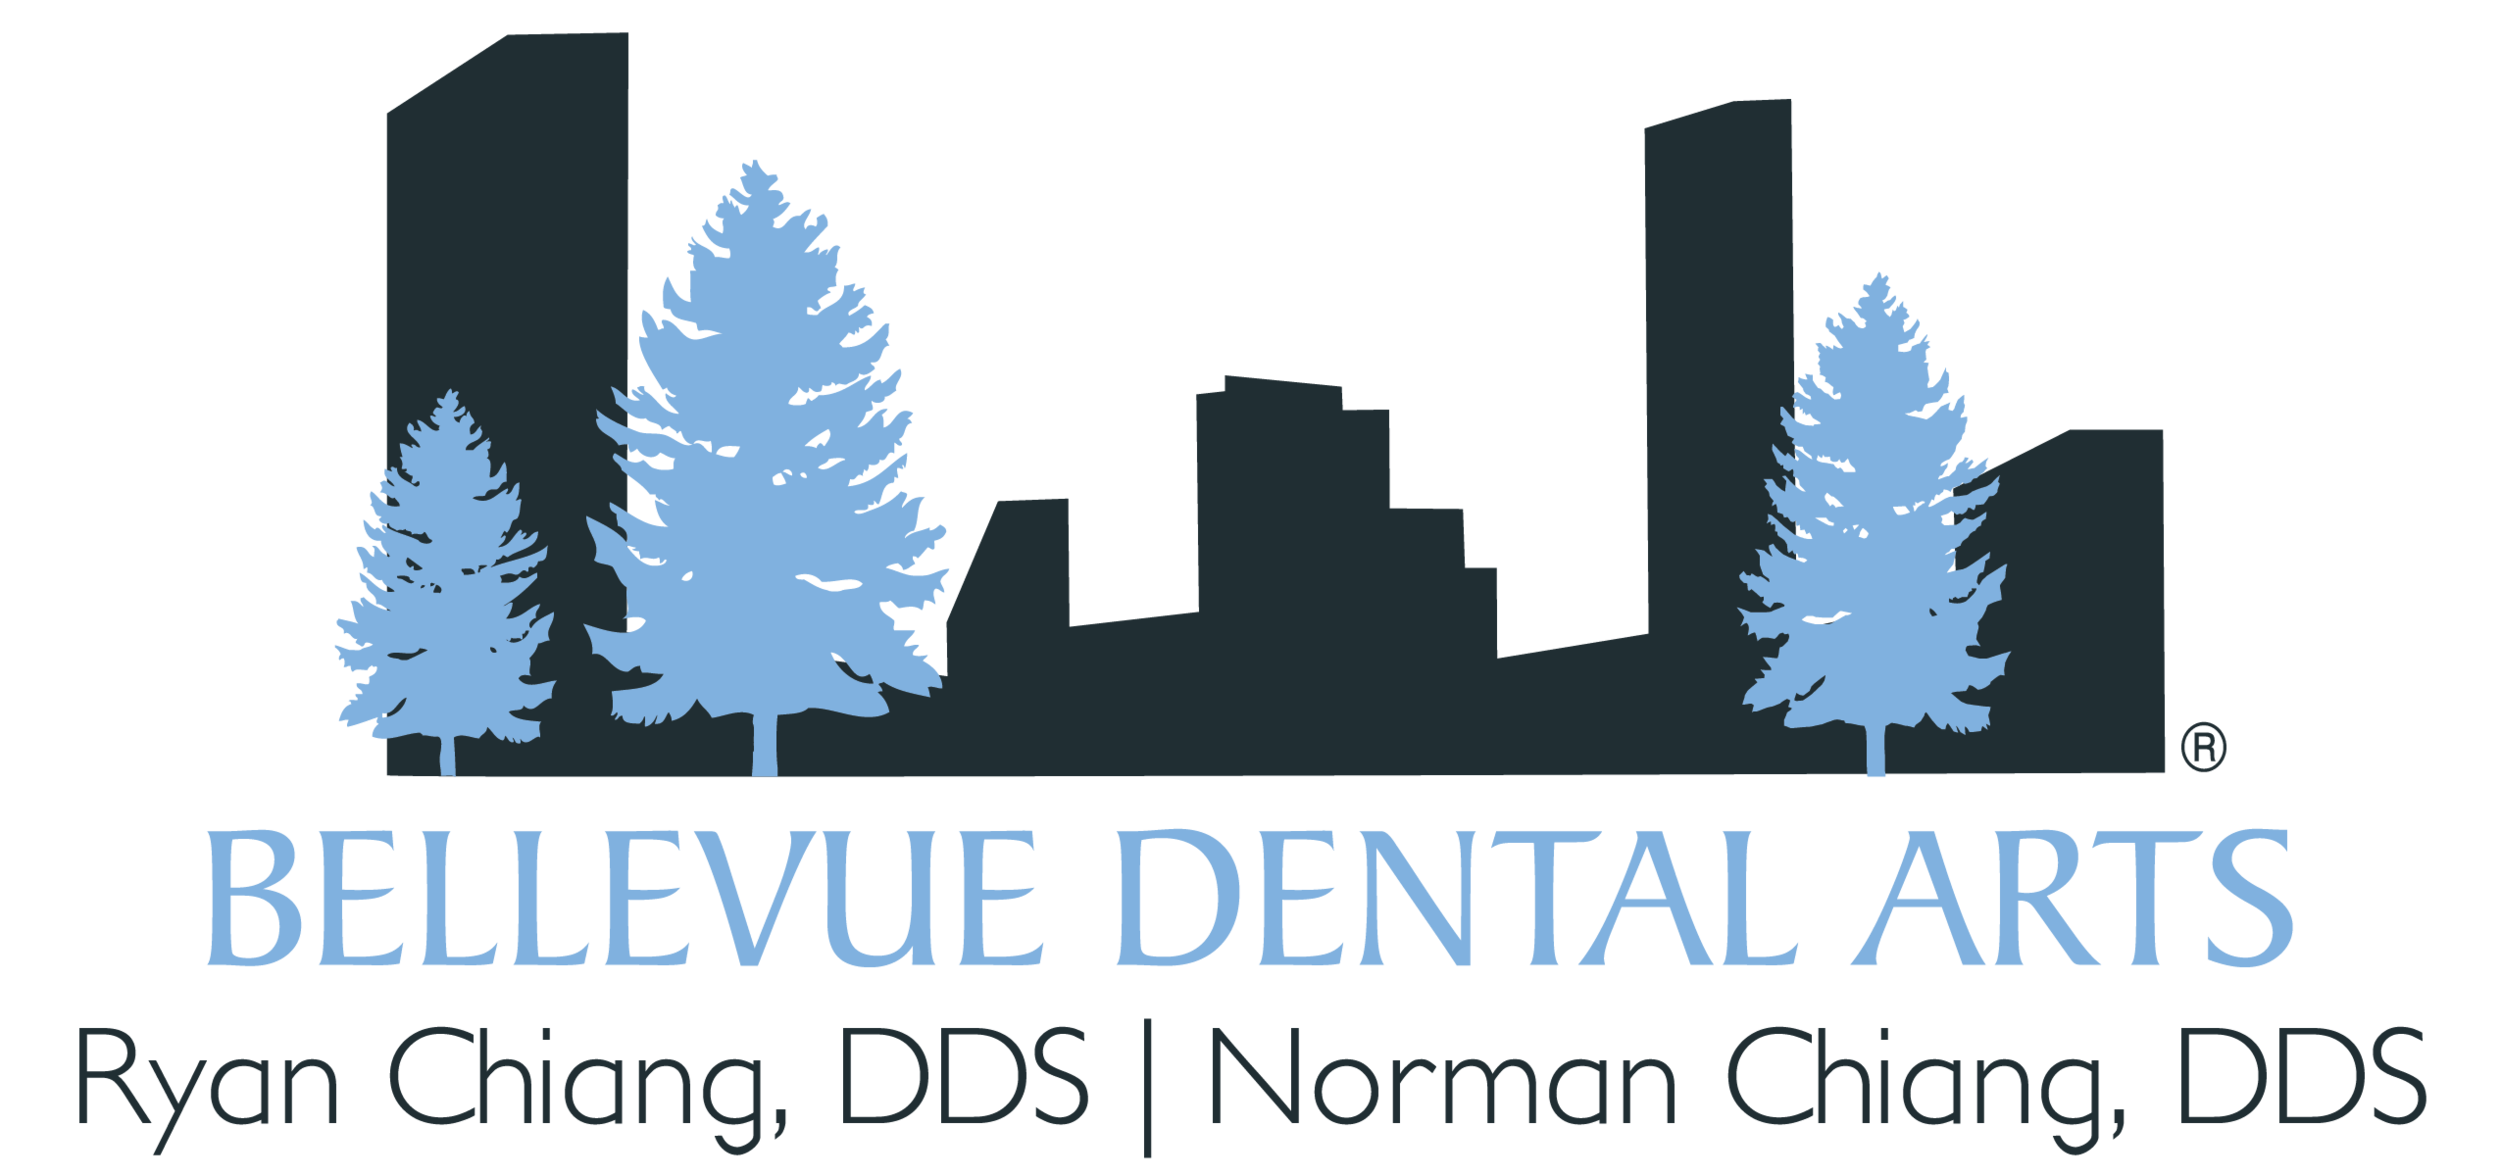 Bellevue Dentist Bellevue Dental Arts Logo